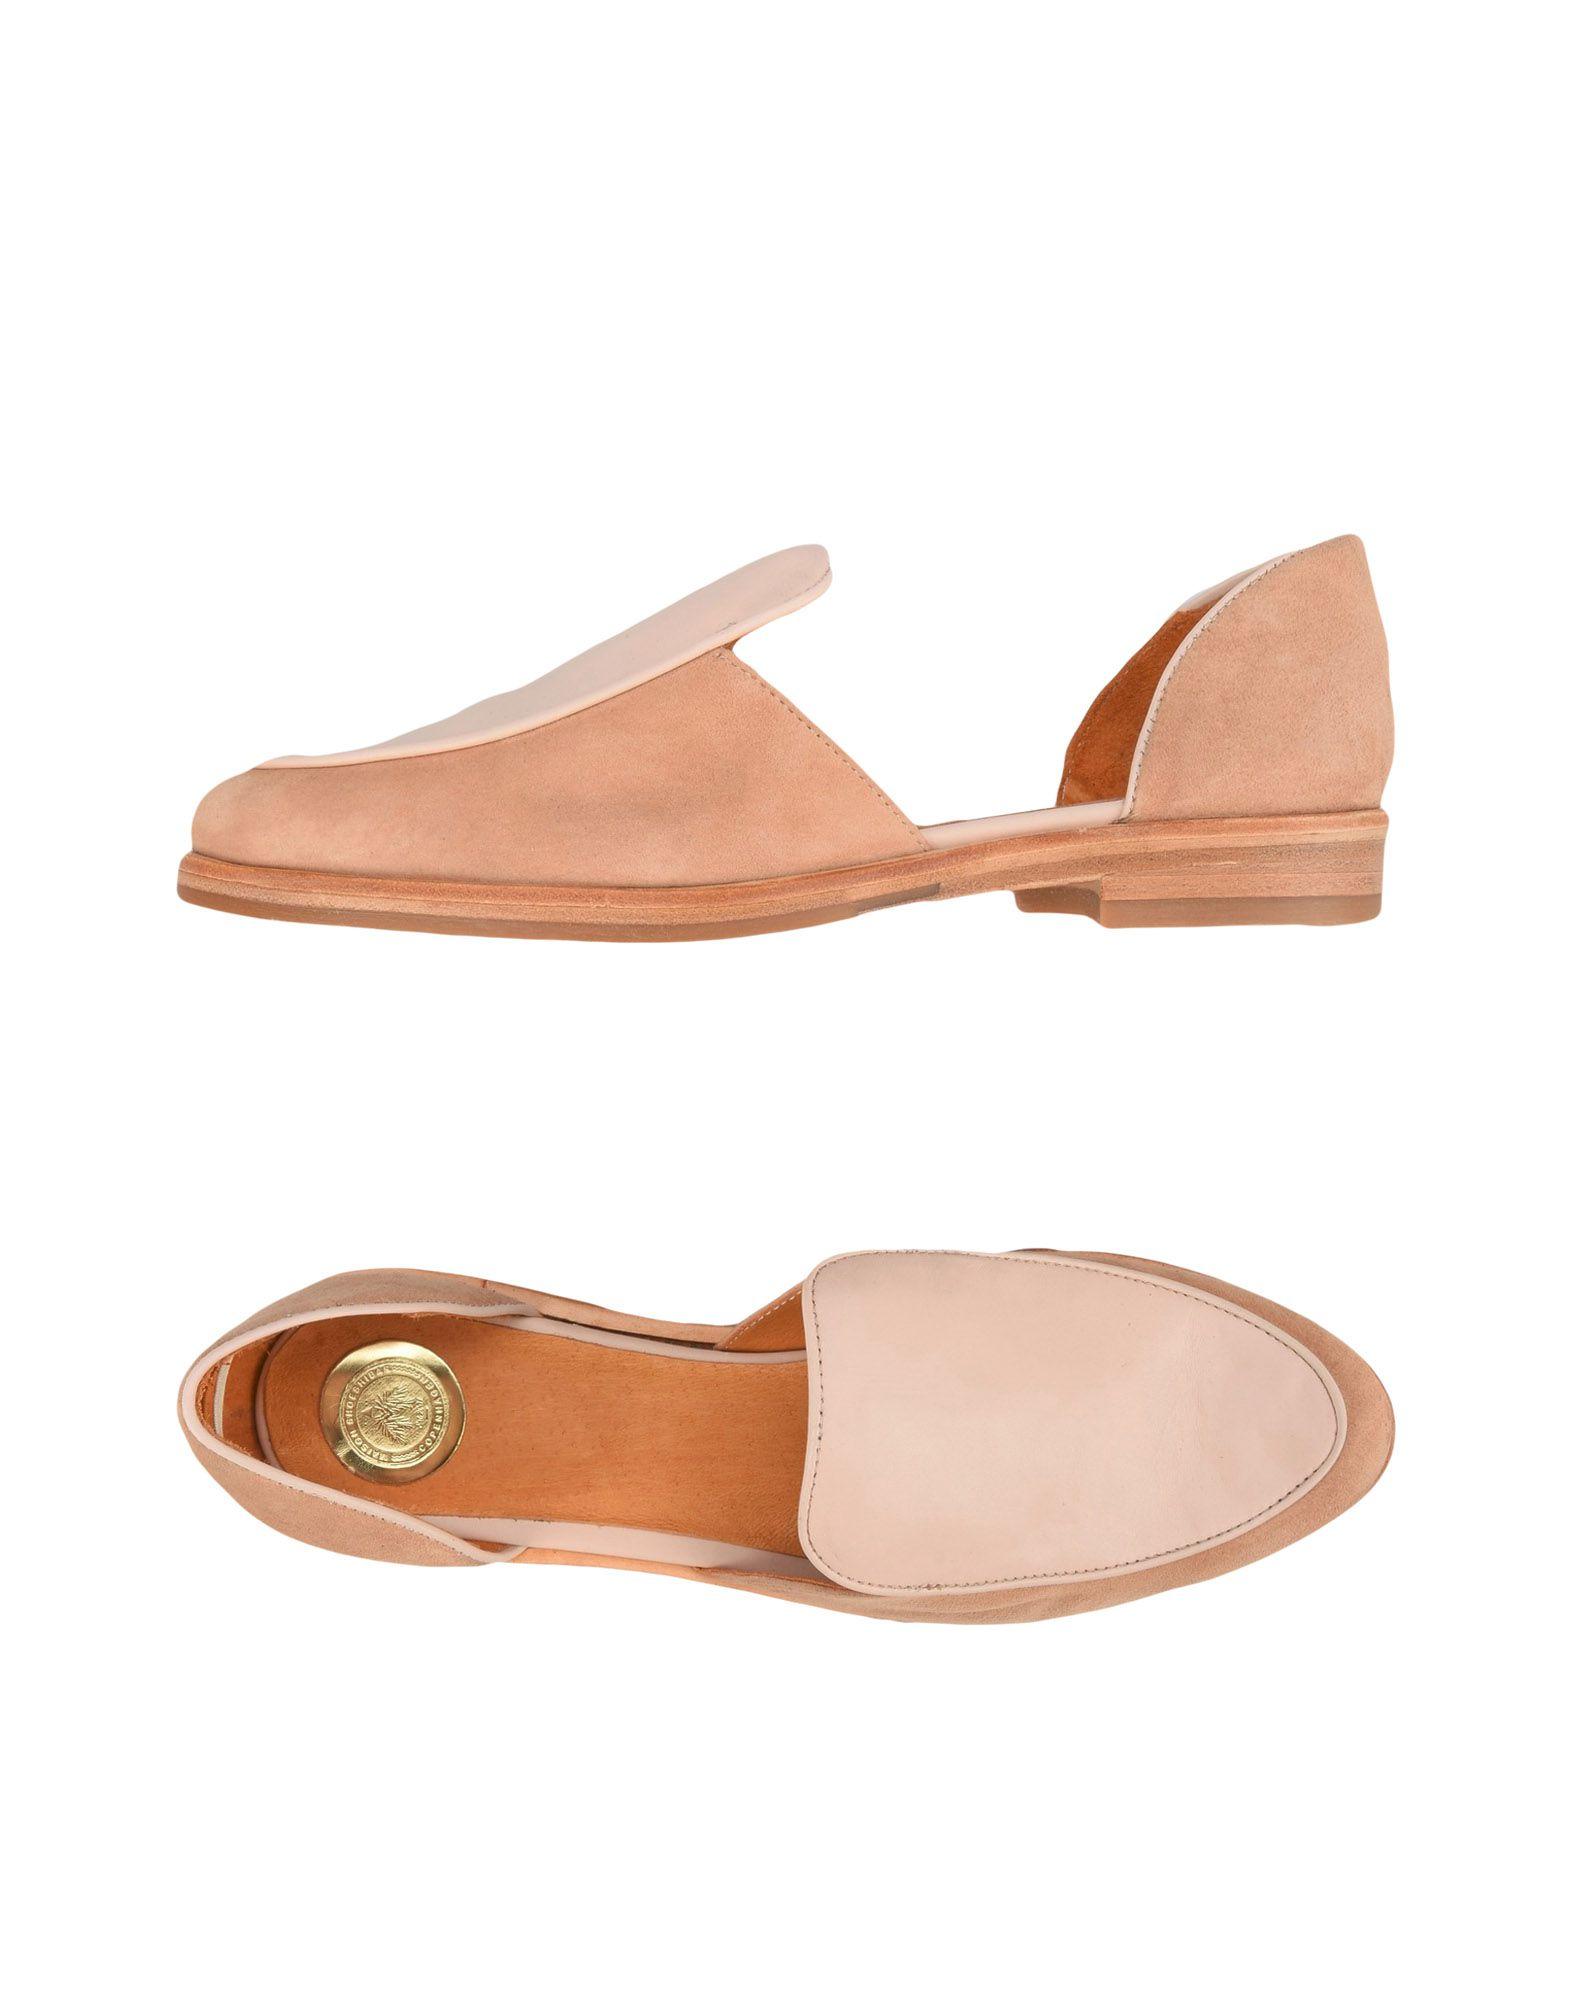 Mocassino Maison Shoeshibar Dagni - Donna - Acquista online su